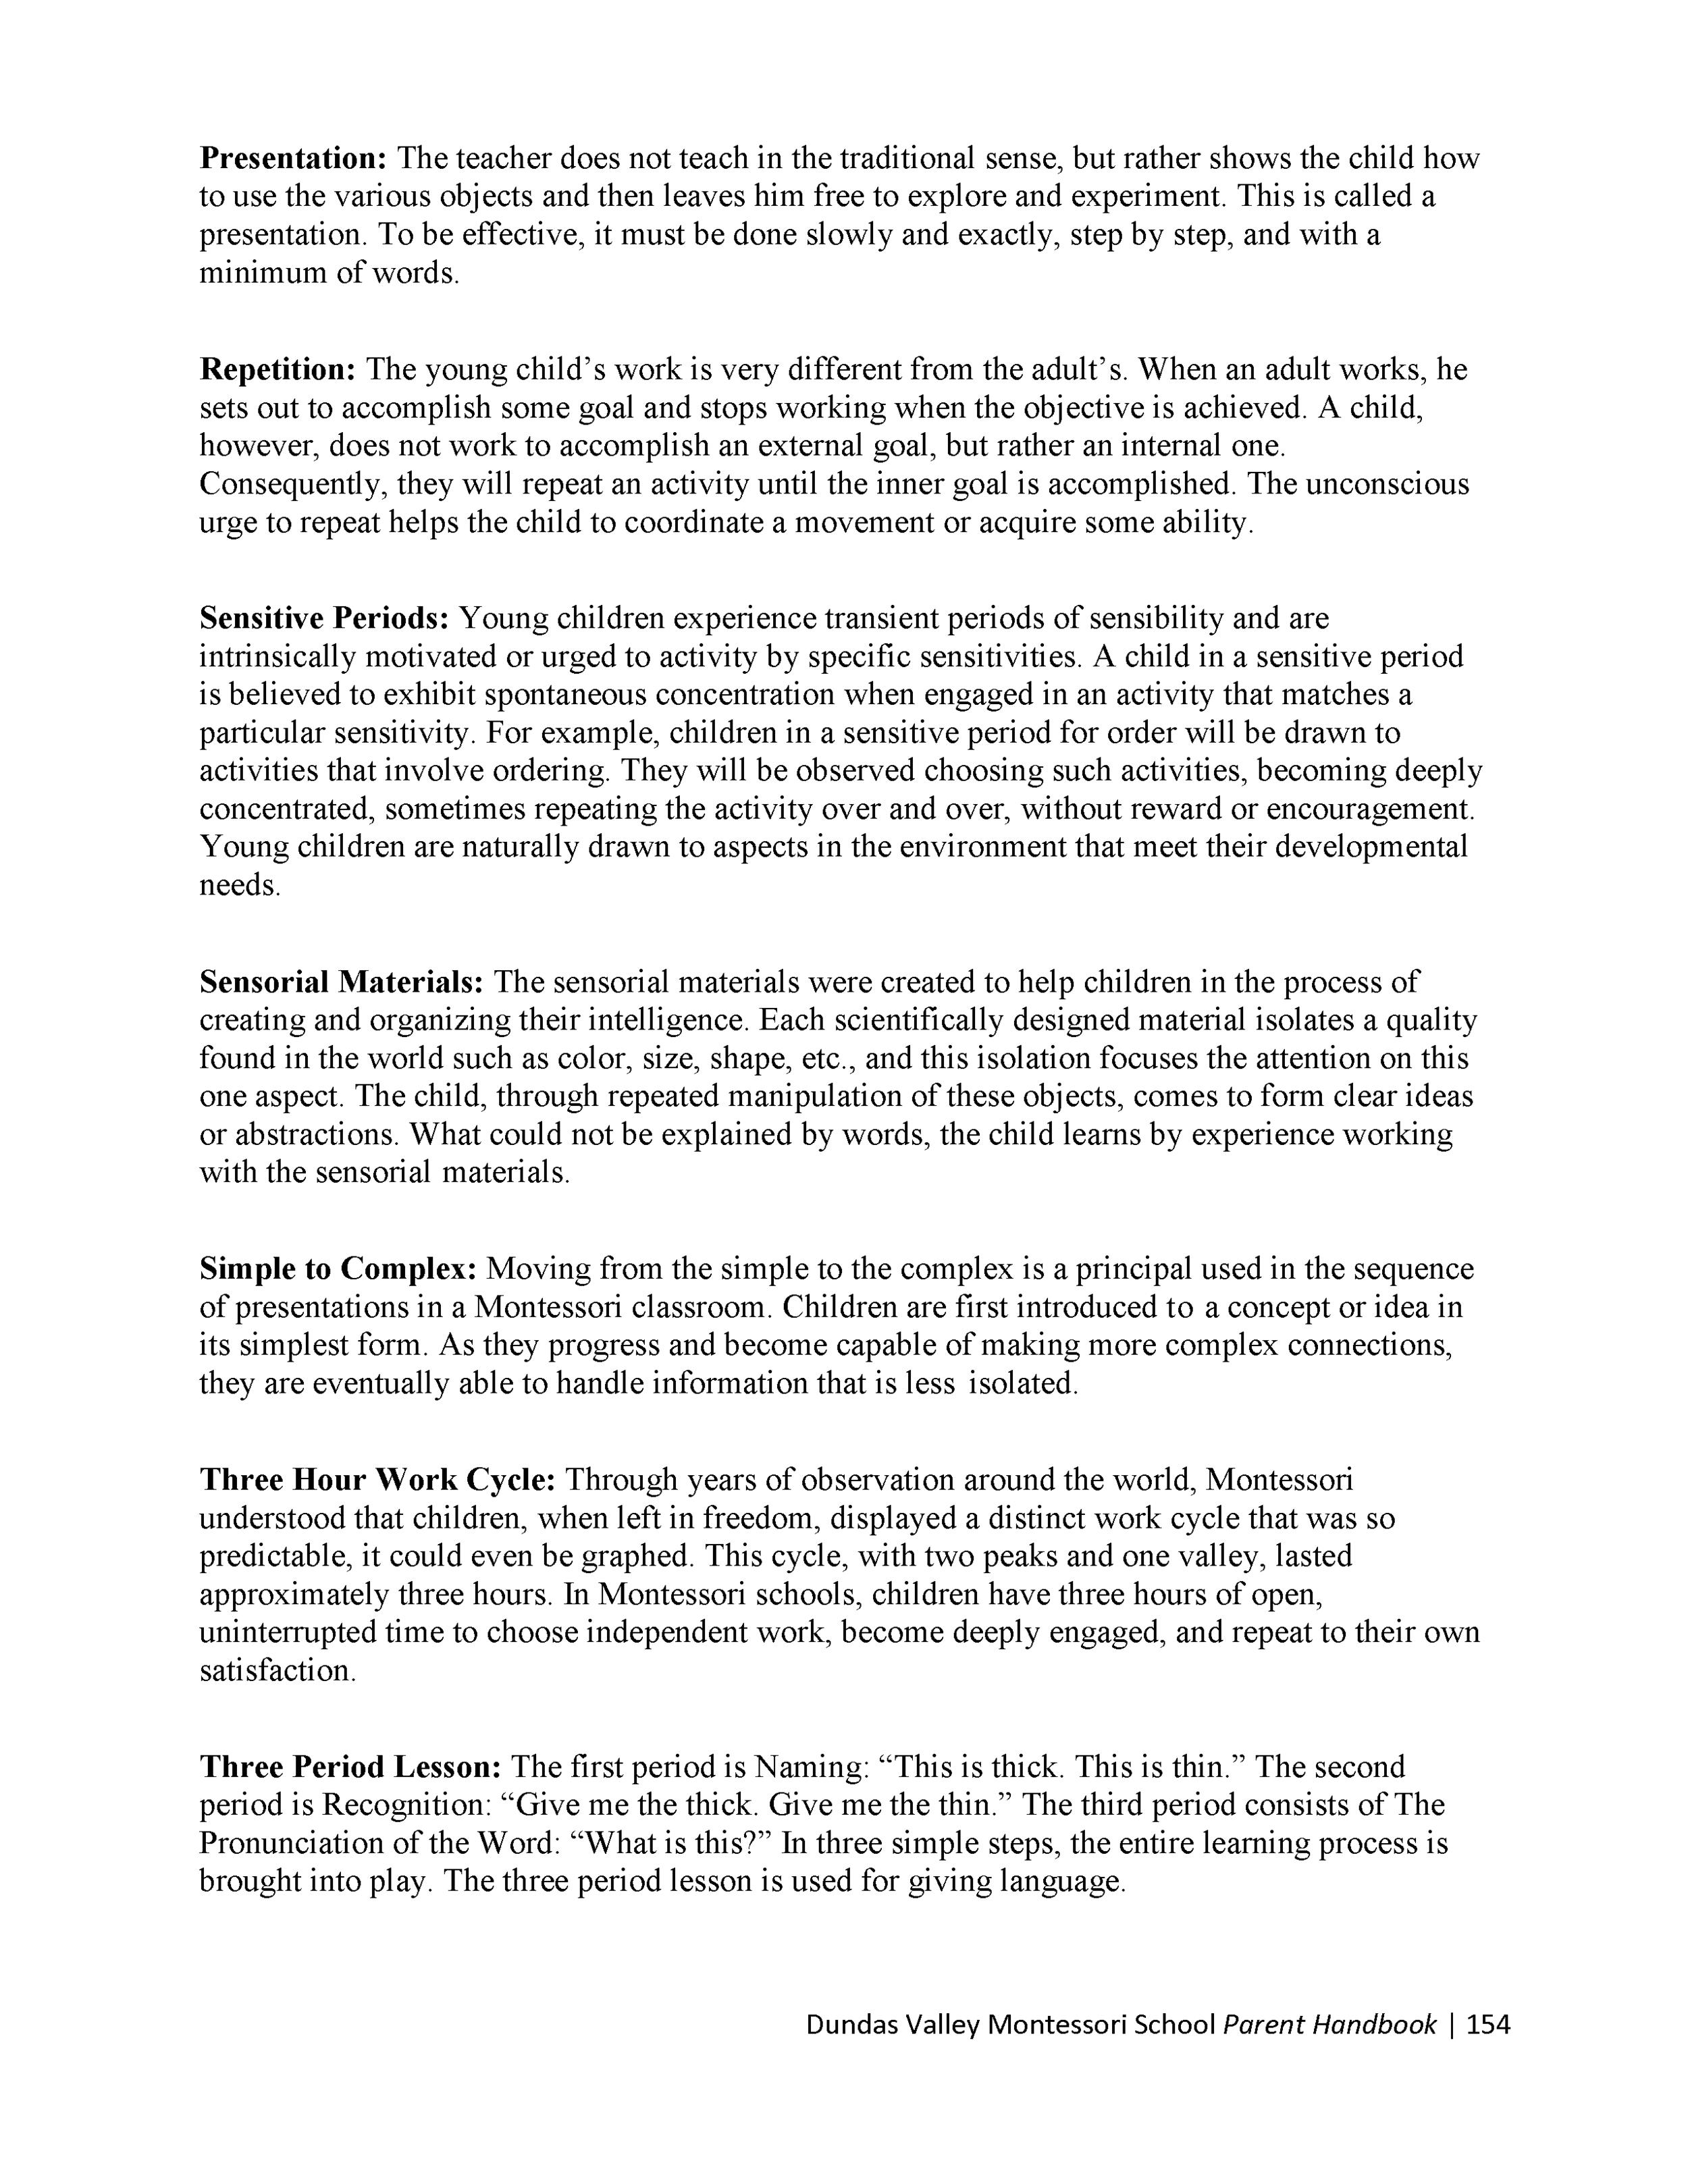 DVMS-Parent-Handbook-19-20_Page_156.png